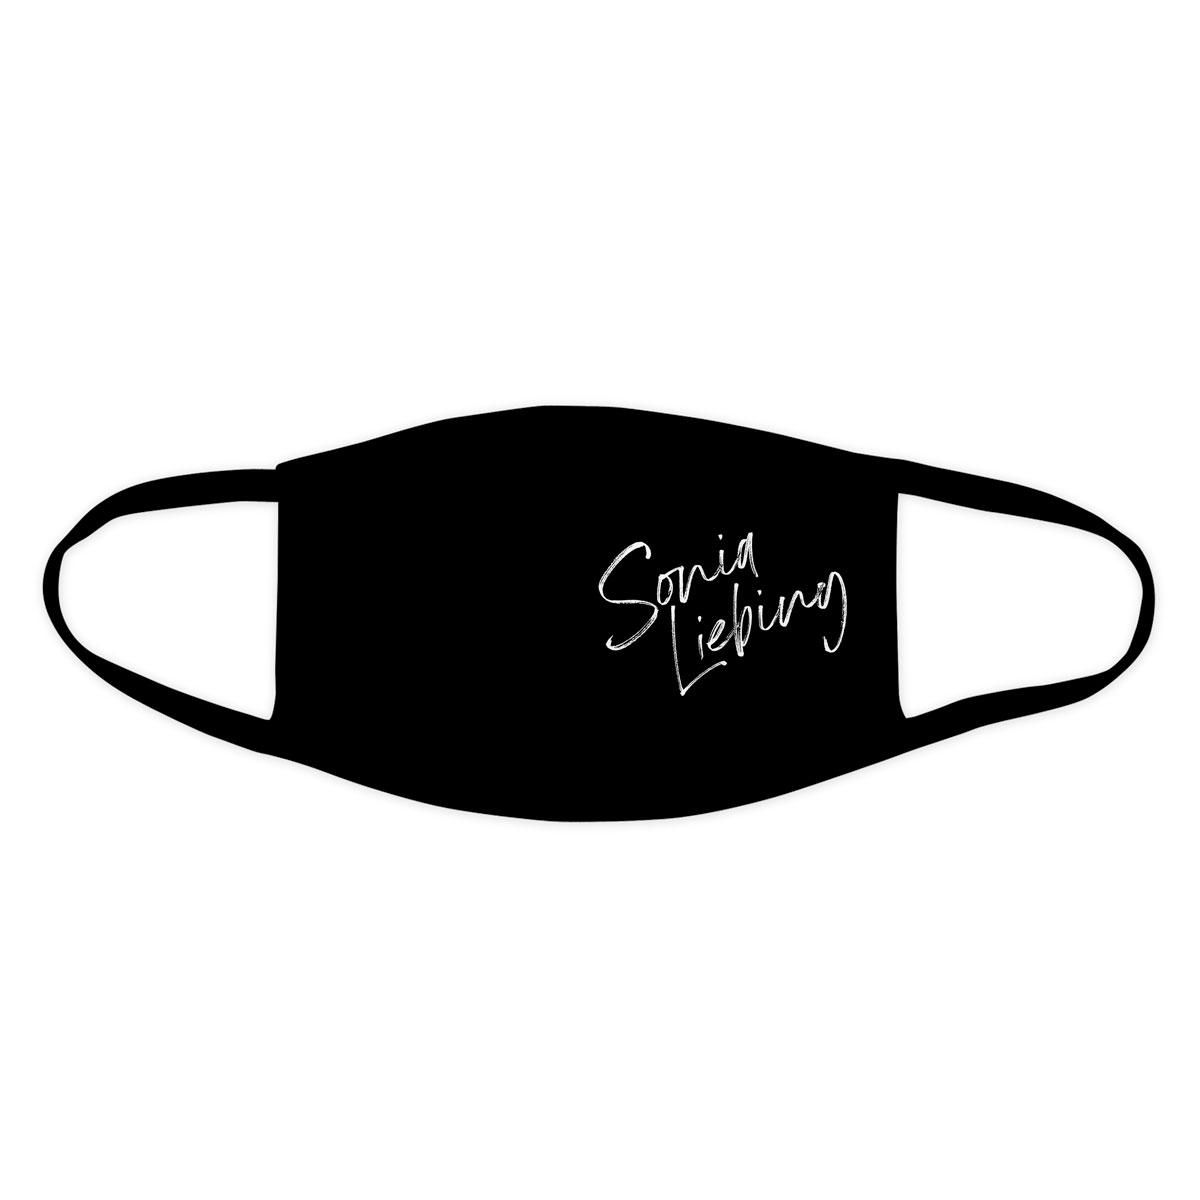 stoffmaske sonia liebing logo schwarz